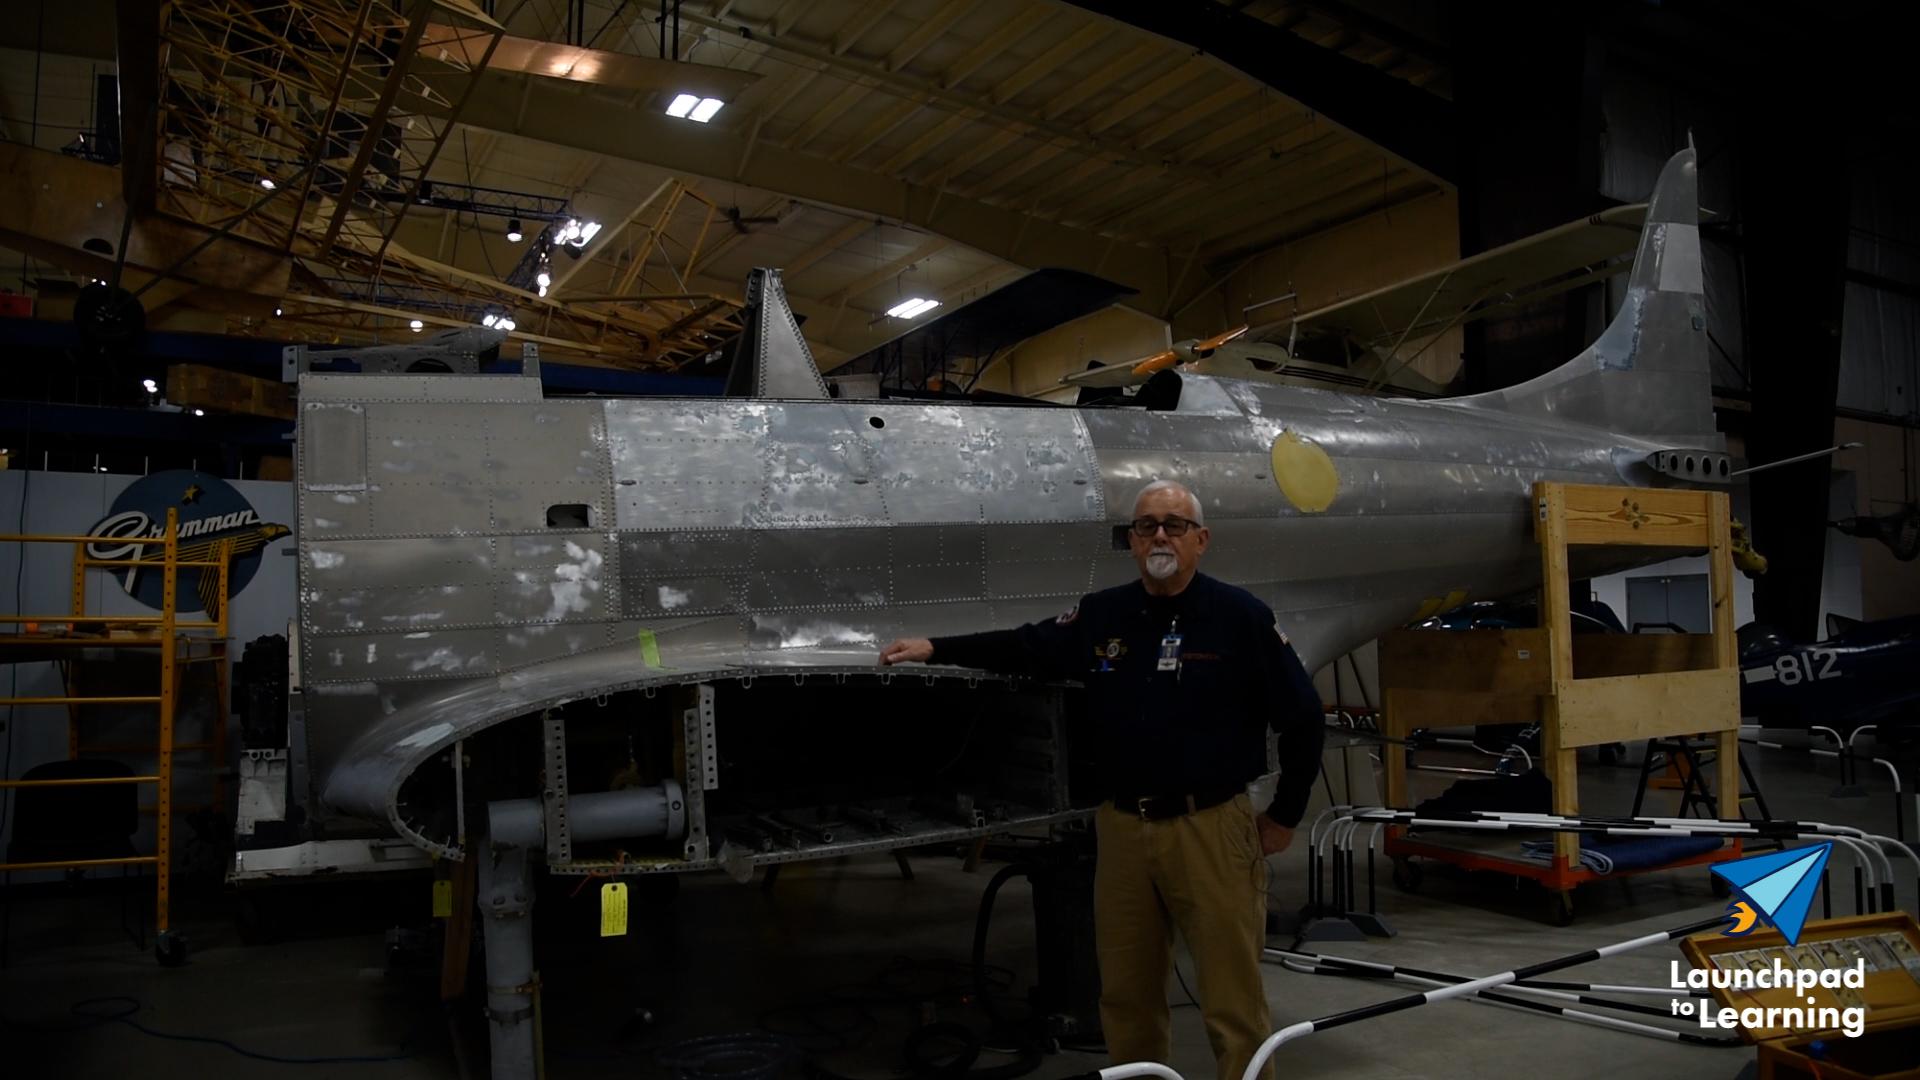 Restoring a Douglas Dauntless Dive-Bomber SBD-2P image